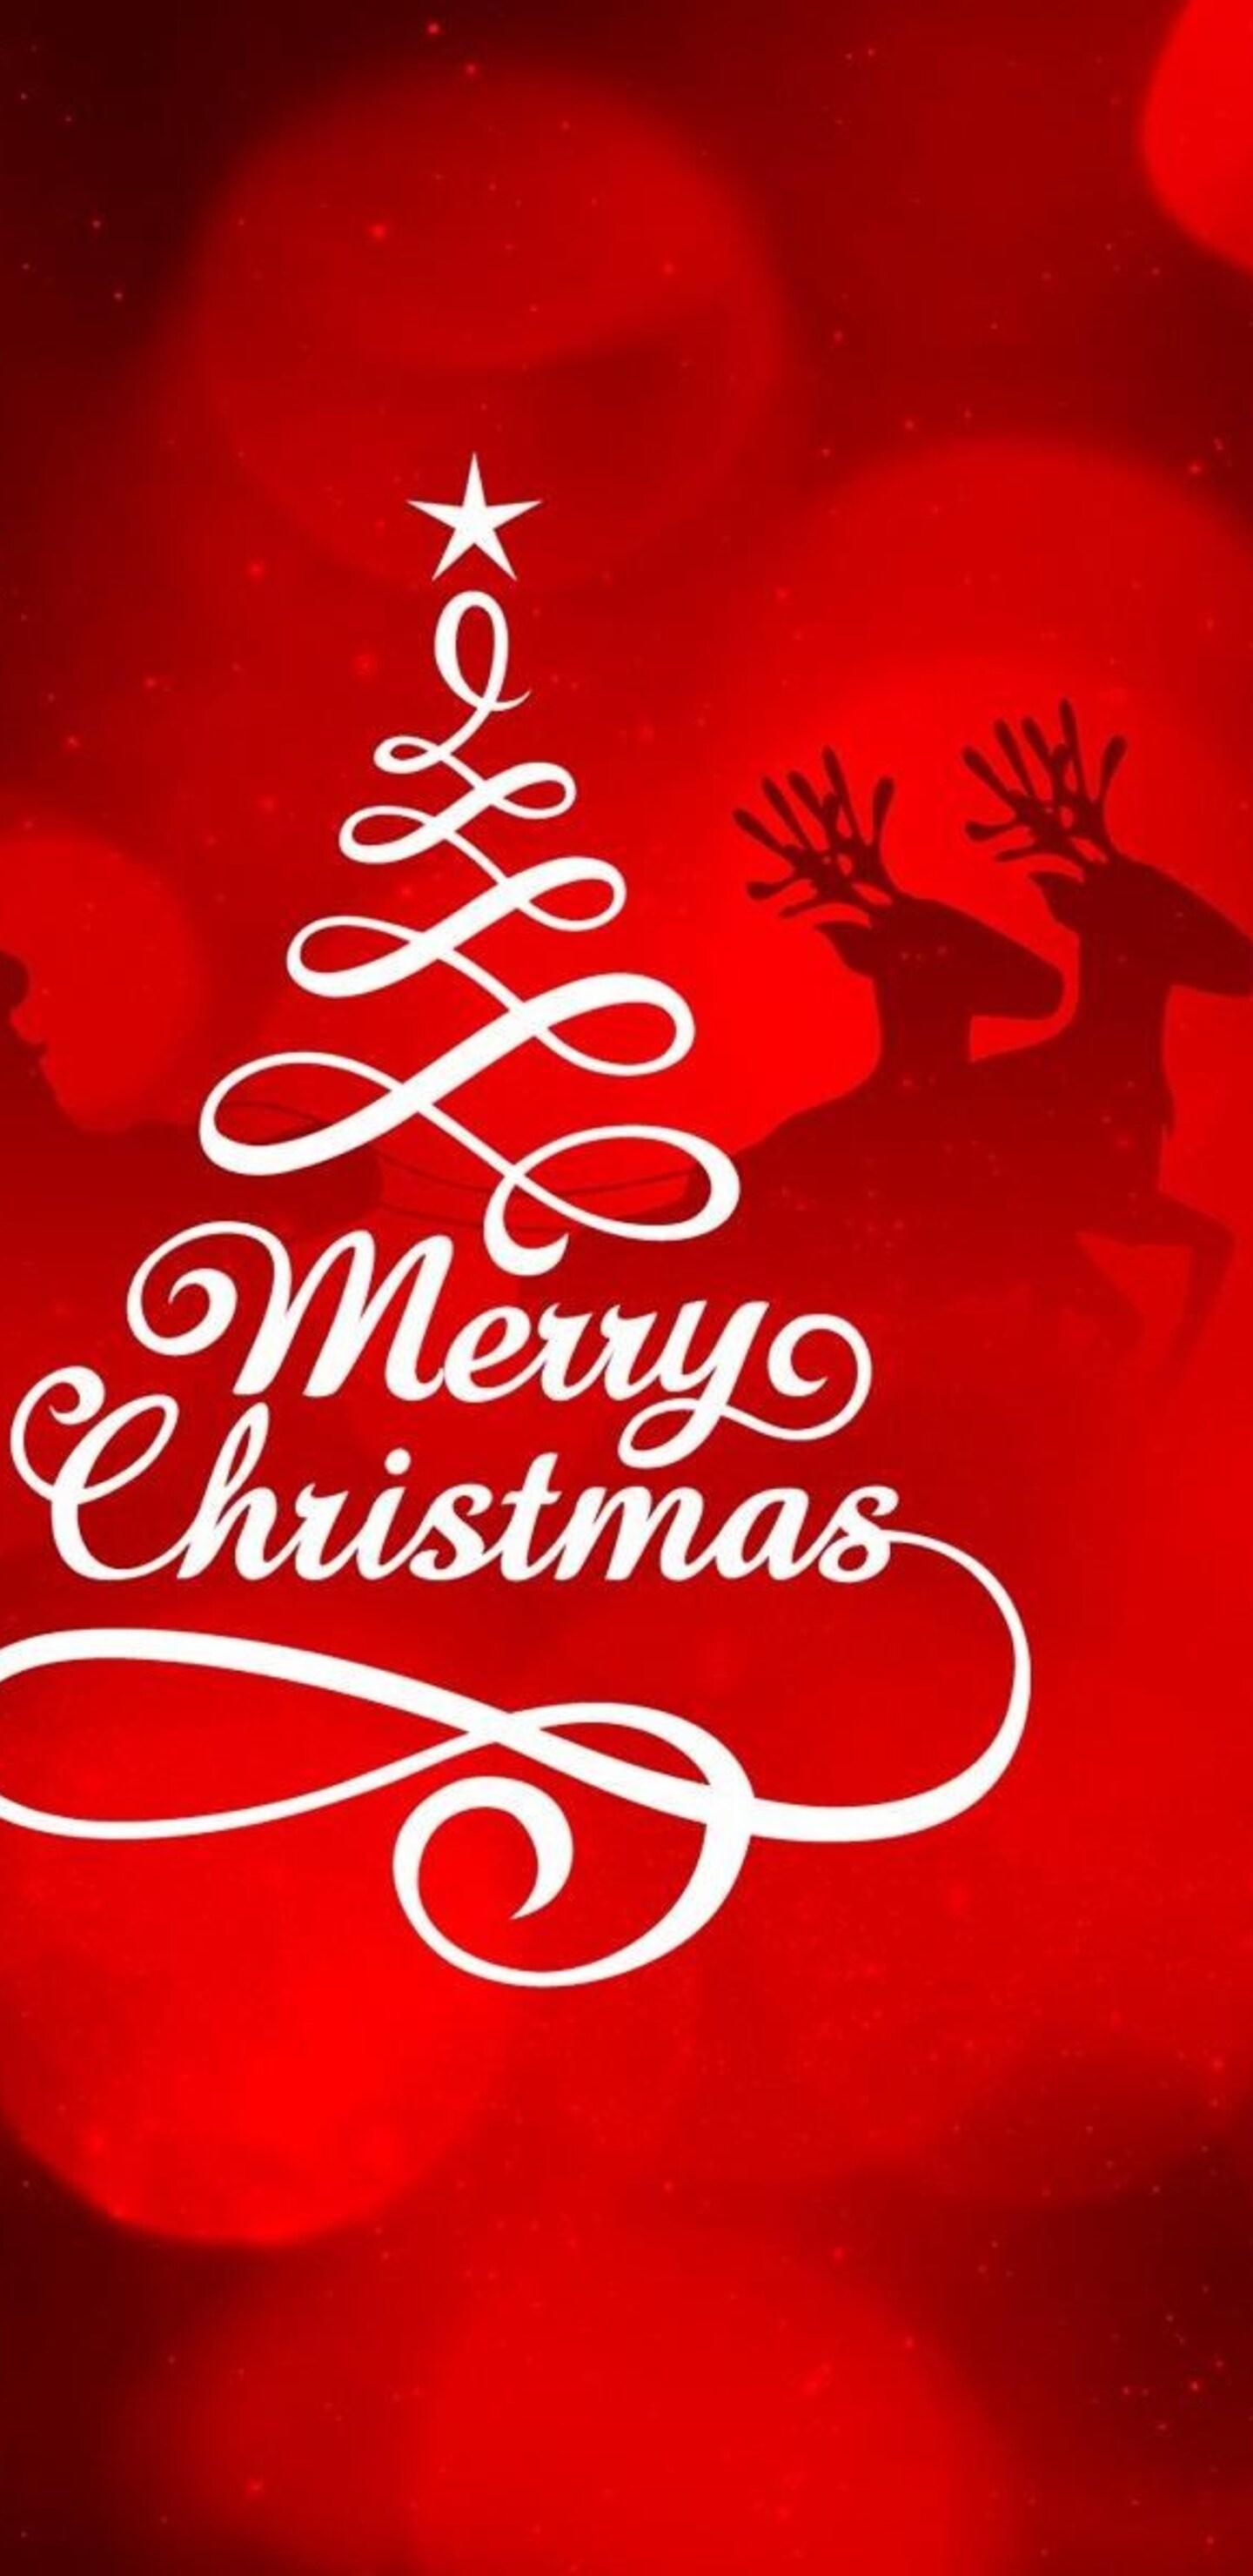 1440x2960 Merry Christmas Samsung Galaxy Note 9 8 S9 S8 S8 Qhd Hd